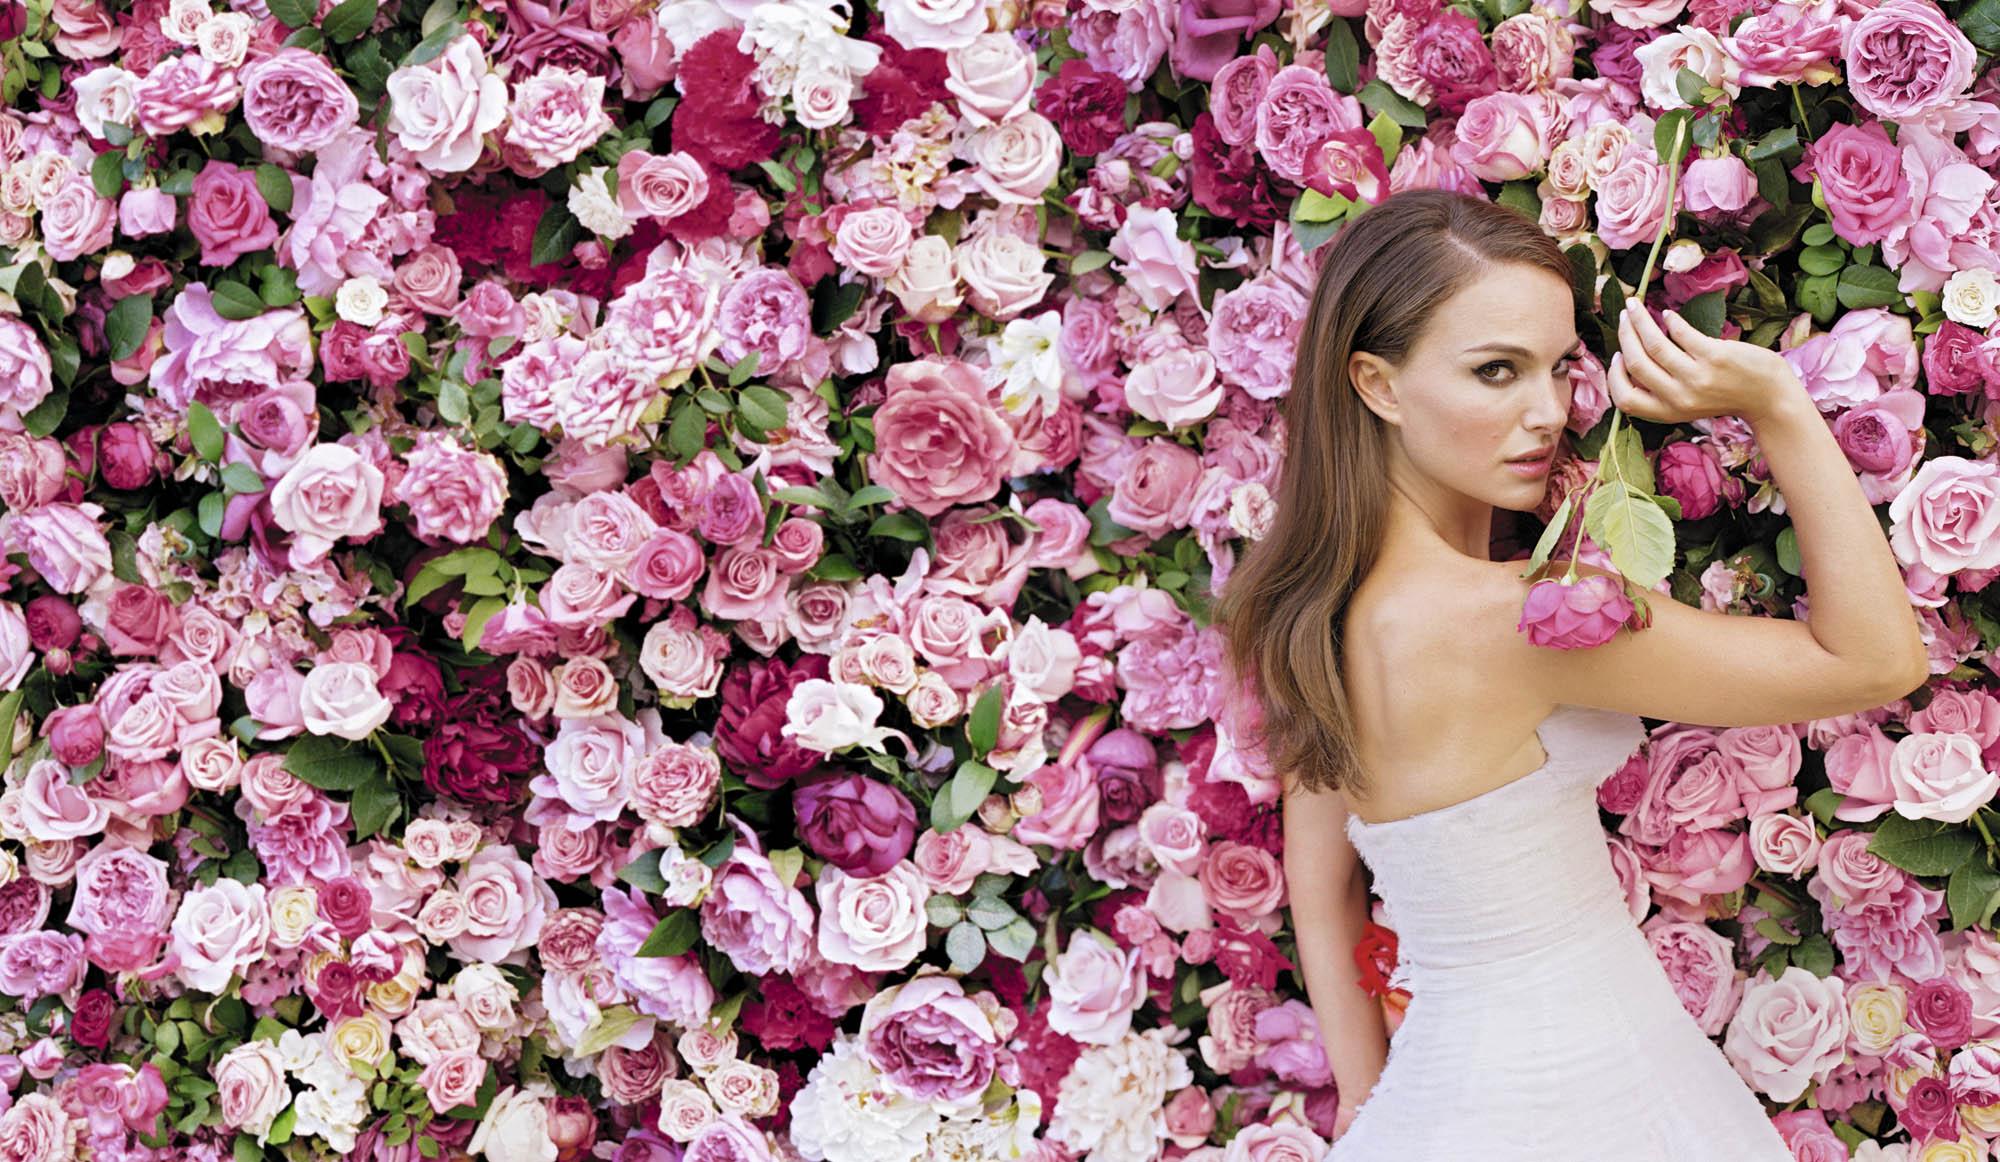 Miss-Dior-2013-Natalie-Portman-sexy-Roses